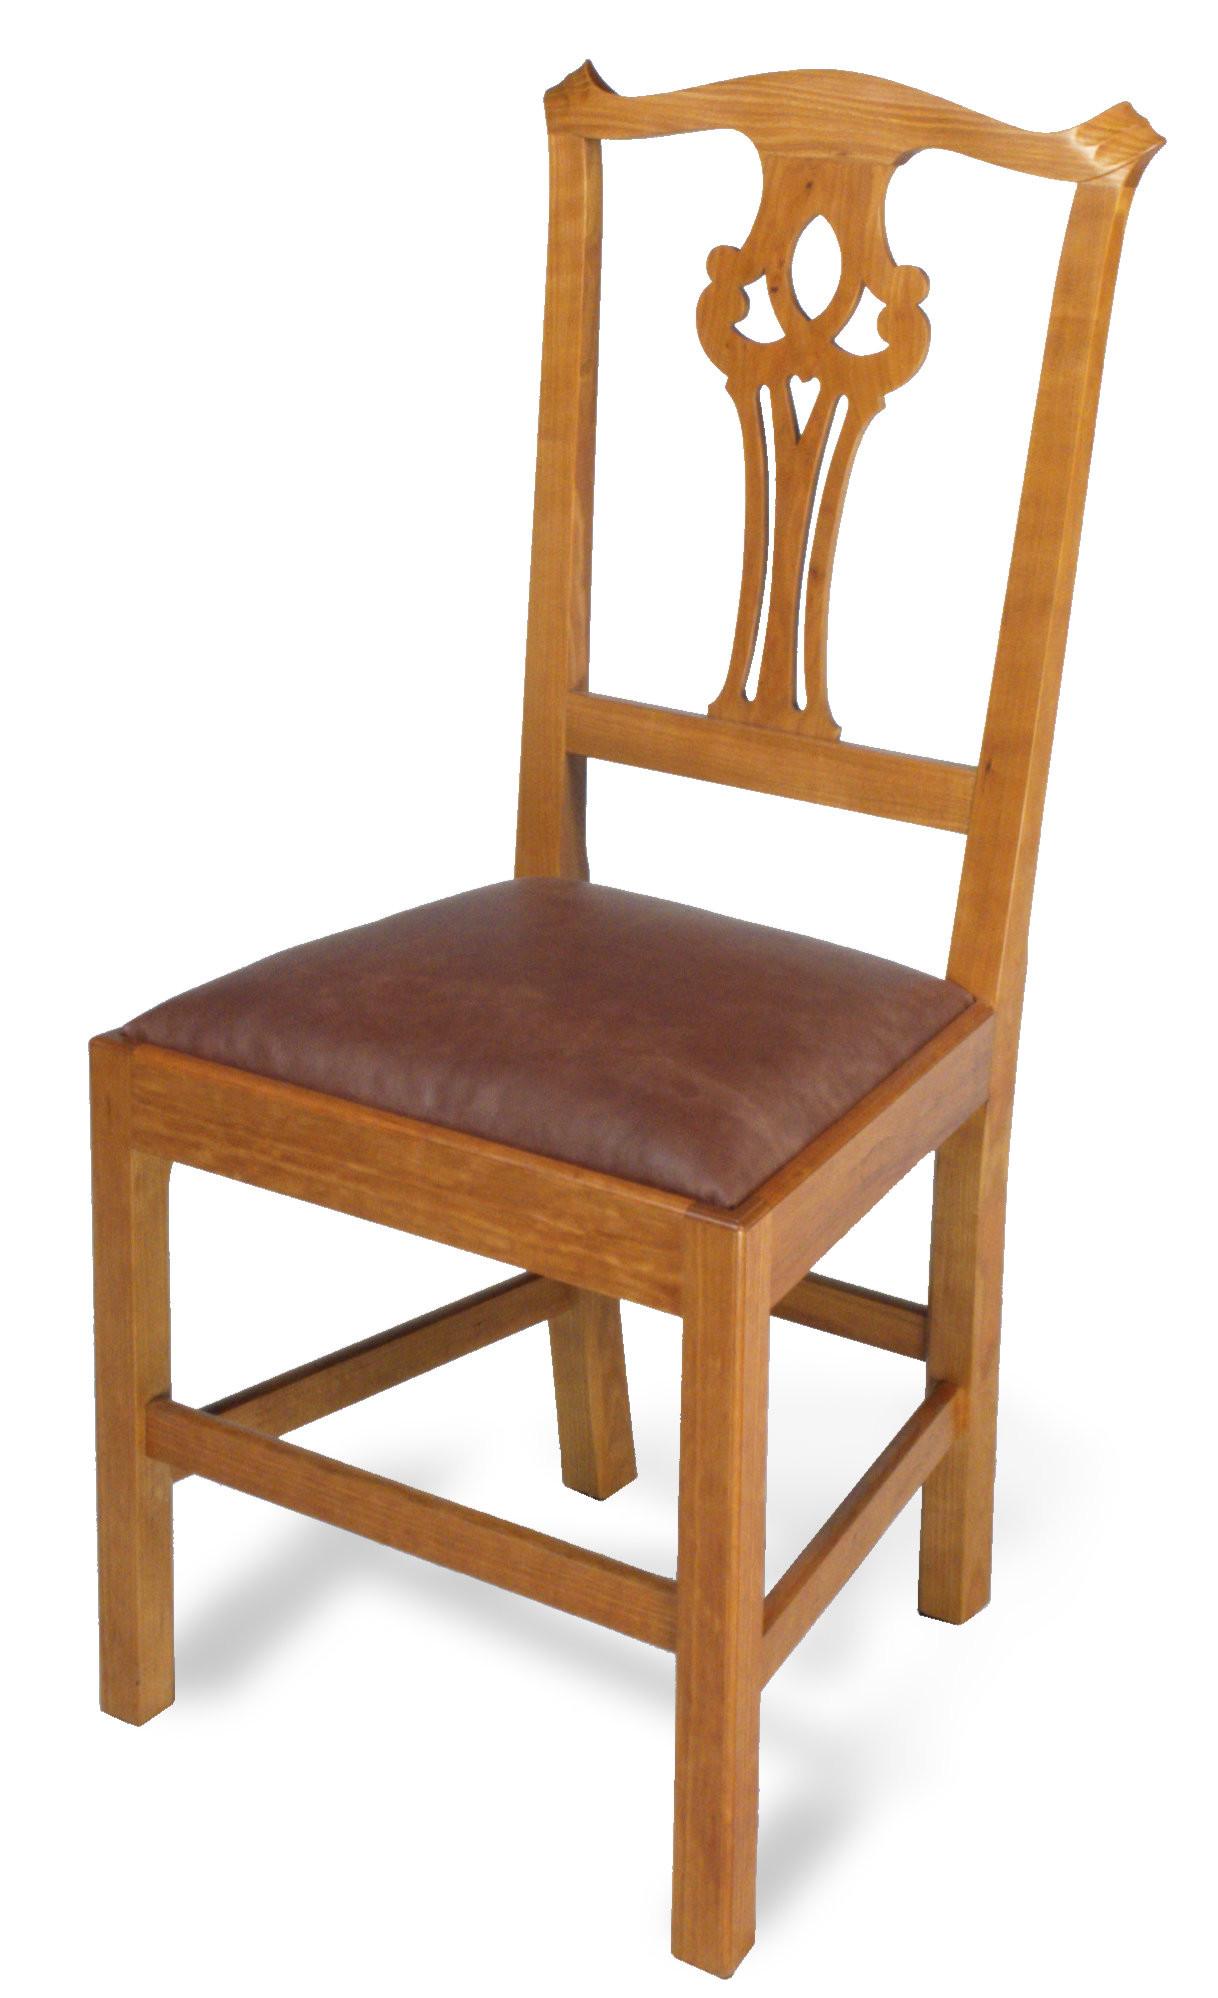 Rumney Chair